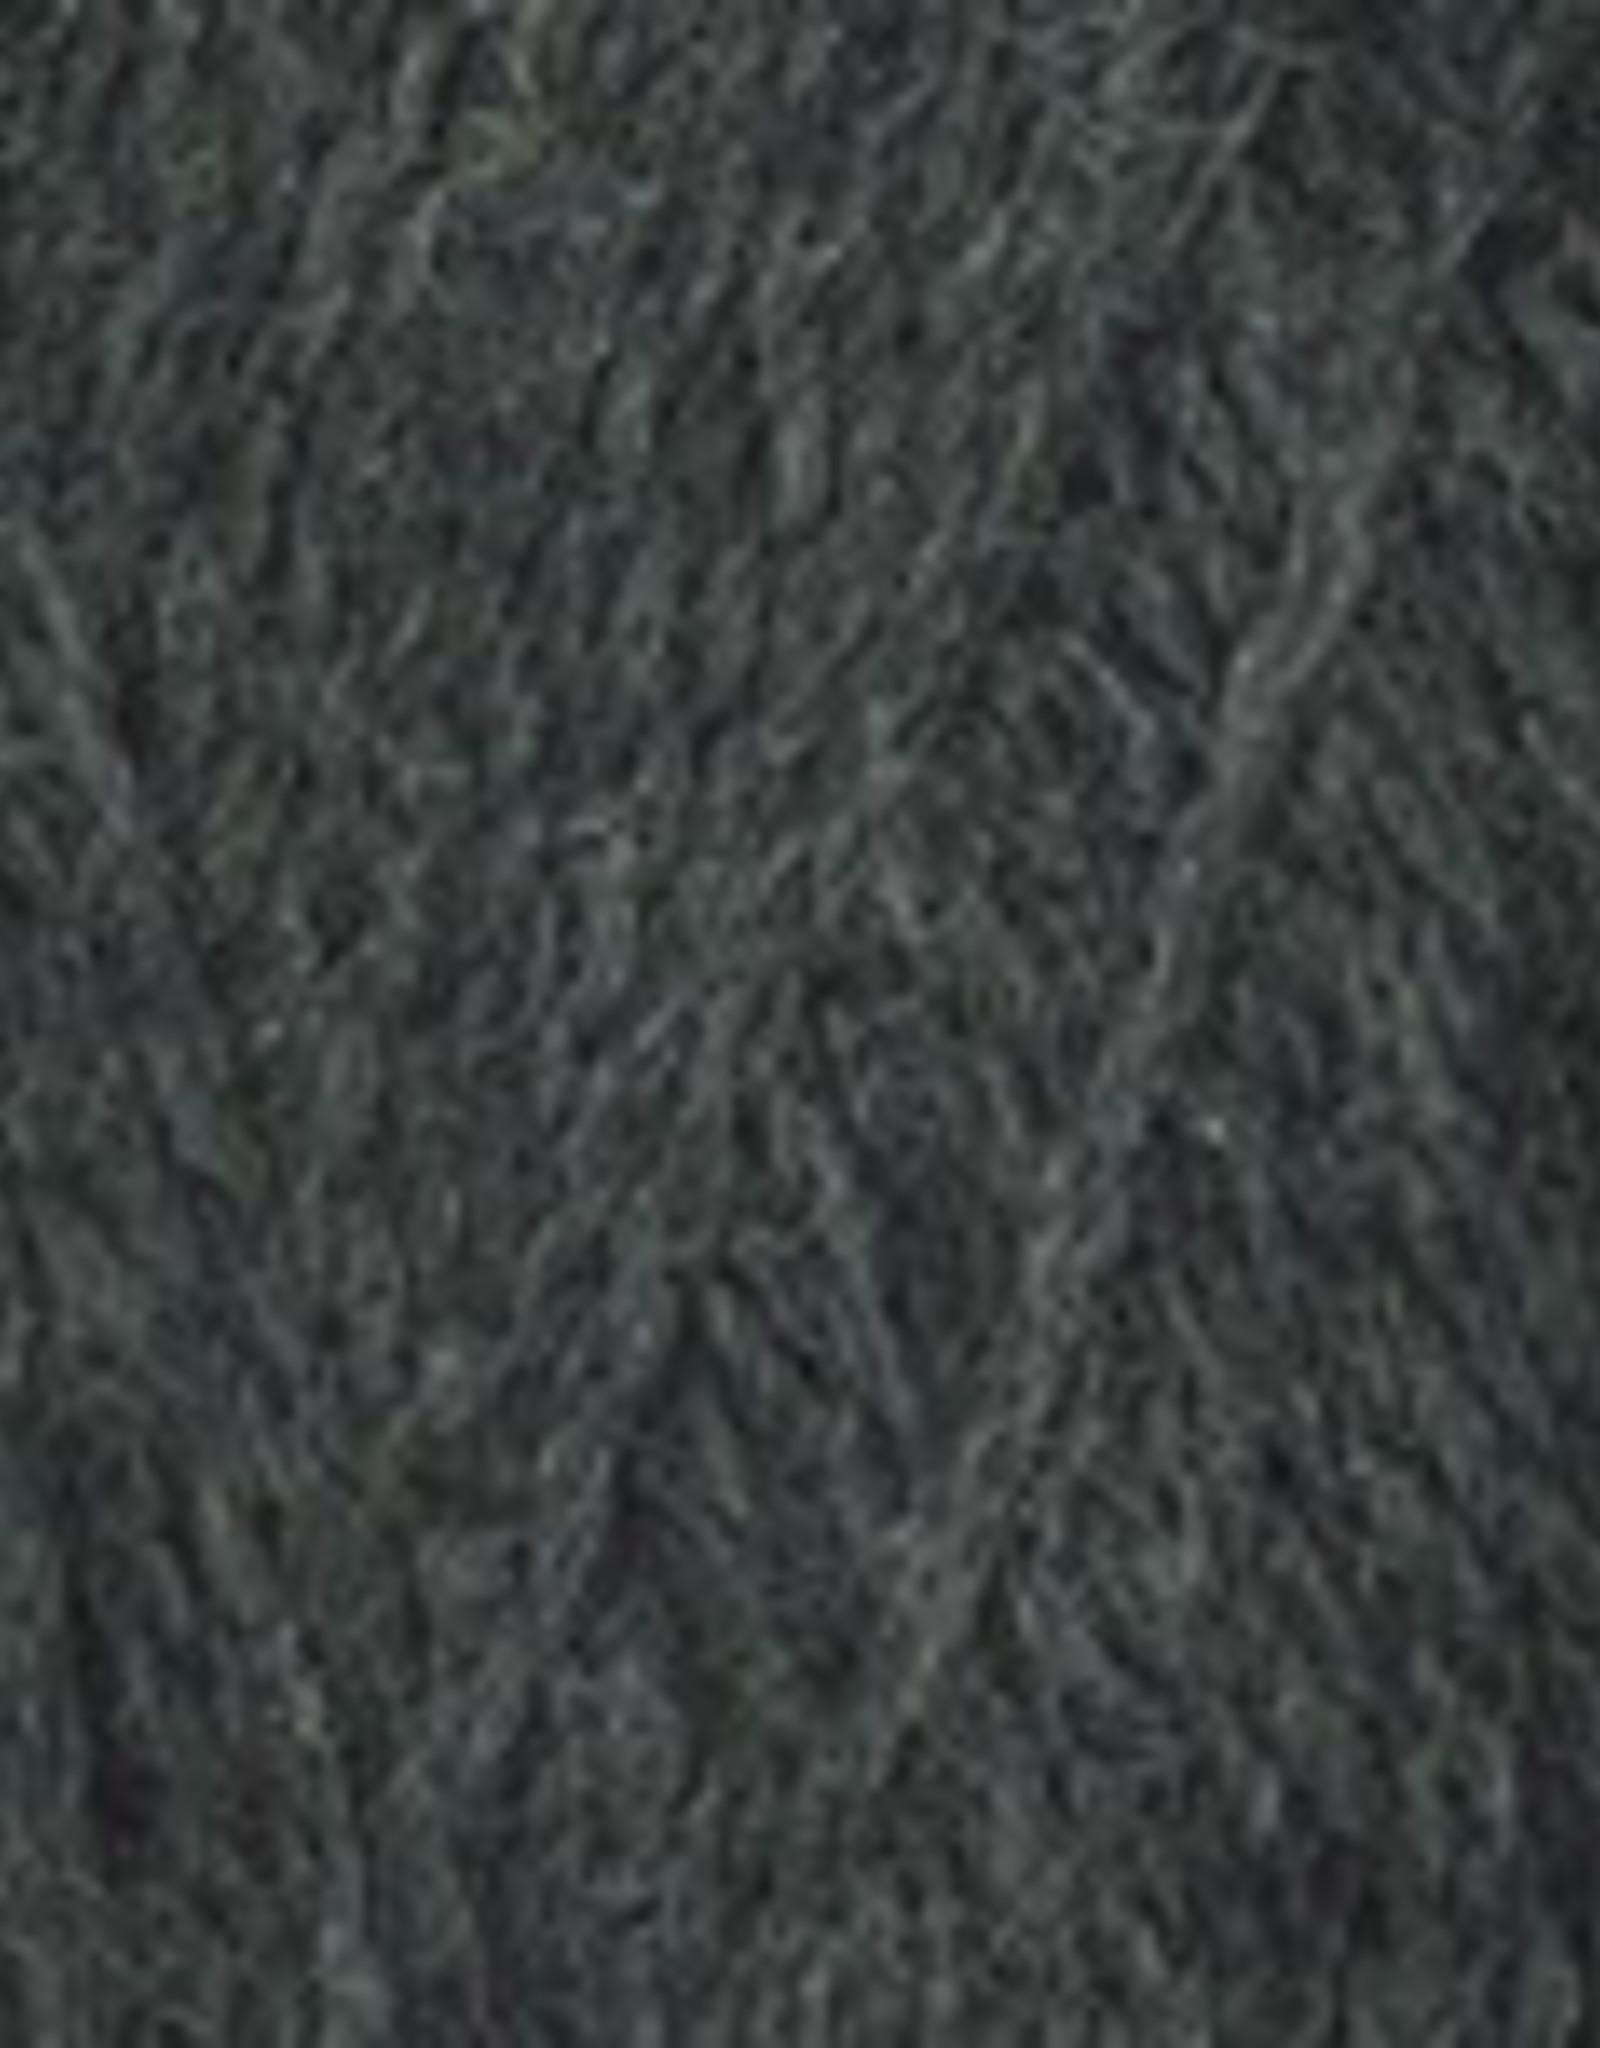 Plymouth Yarns Galway Sport 50g 704 dark charcoal heather